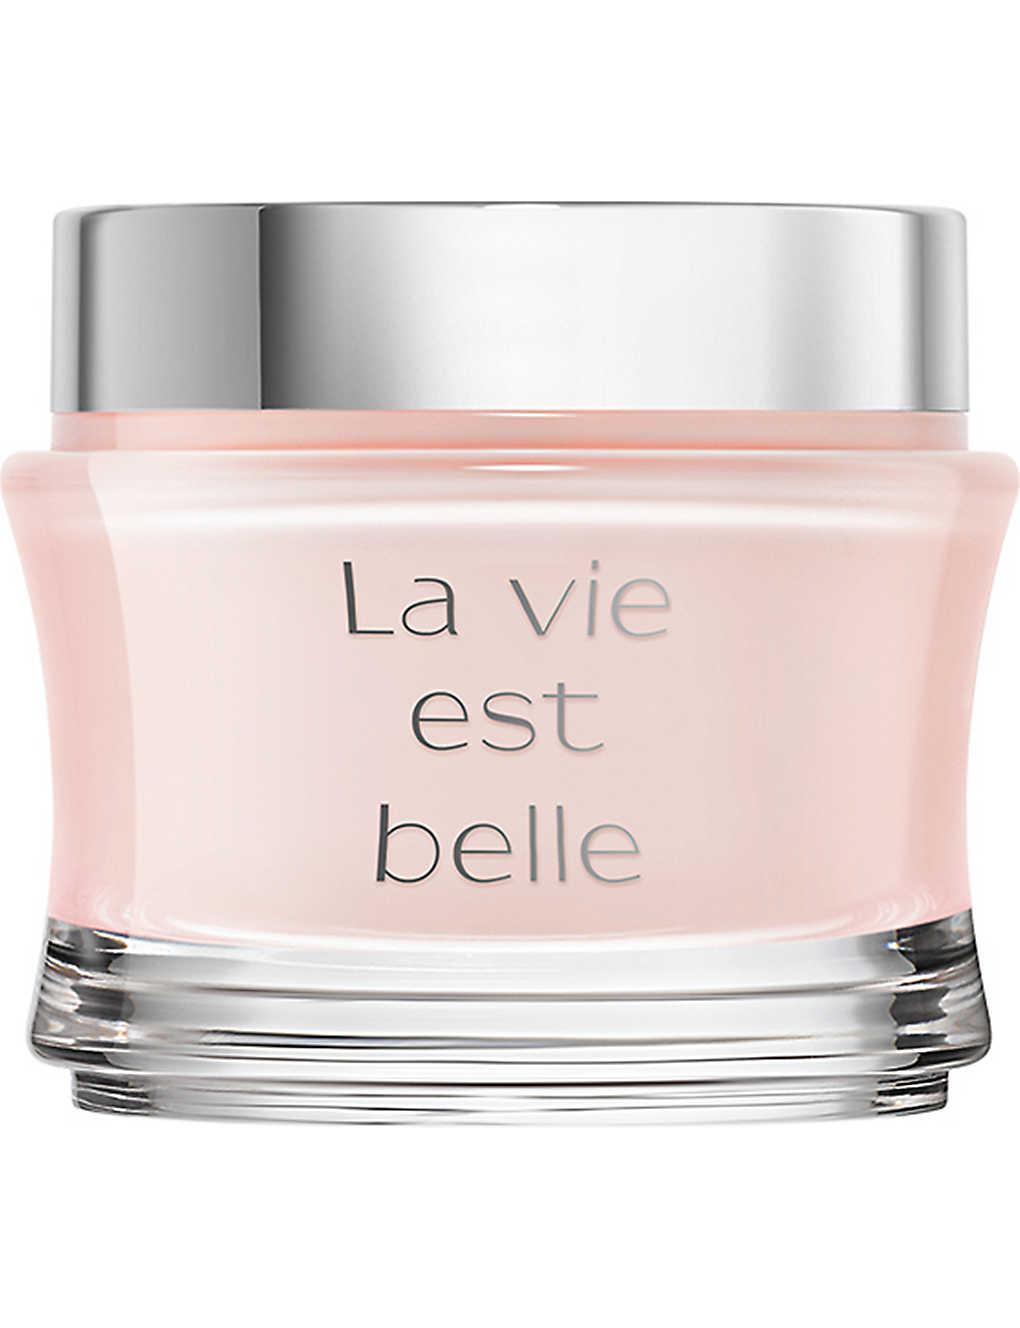 76cca2f1f LANCOME - La Vie Est Belle Exquisite Body Cream 200ml   Selfridges.com